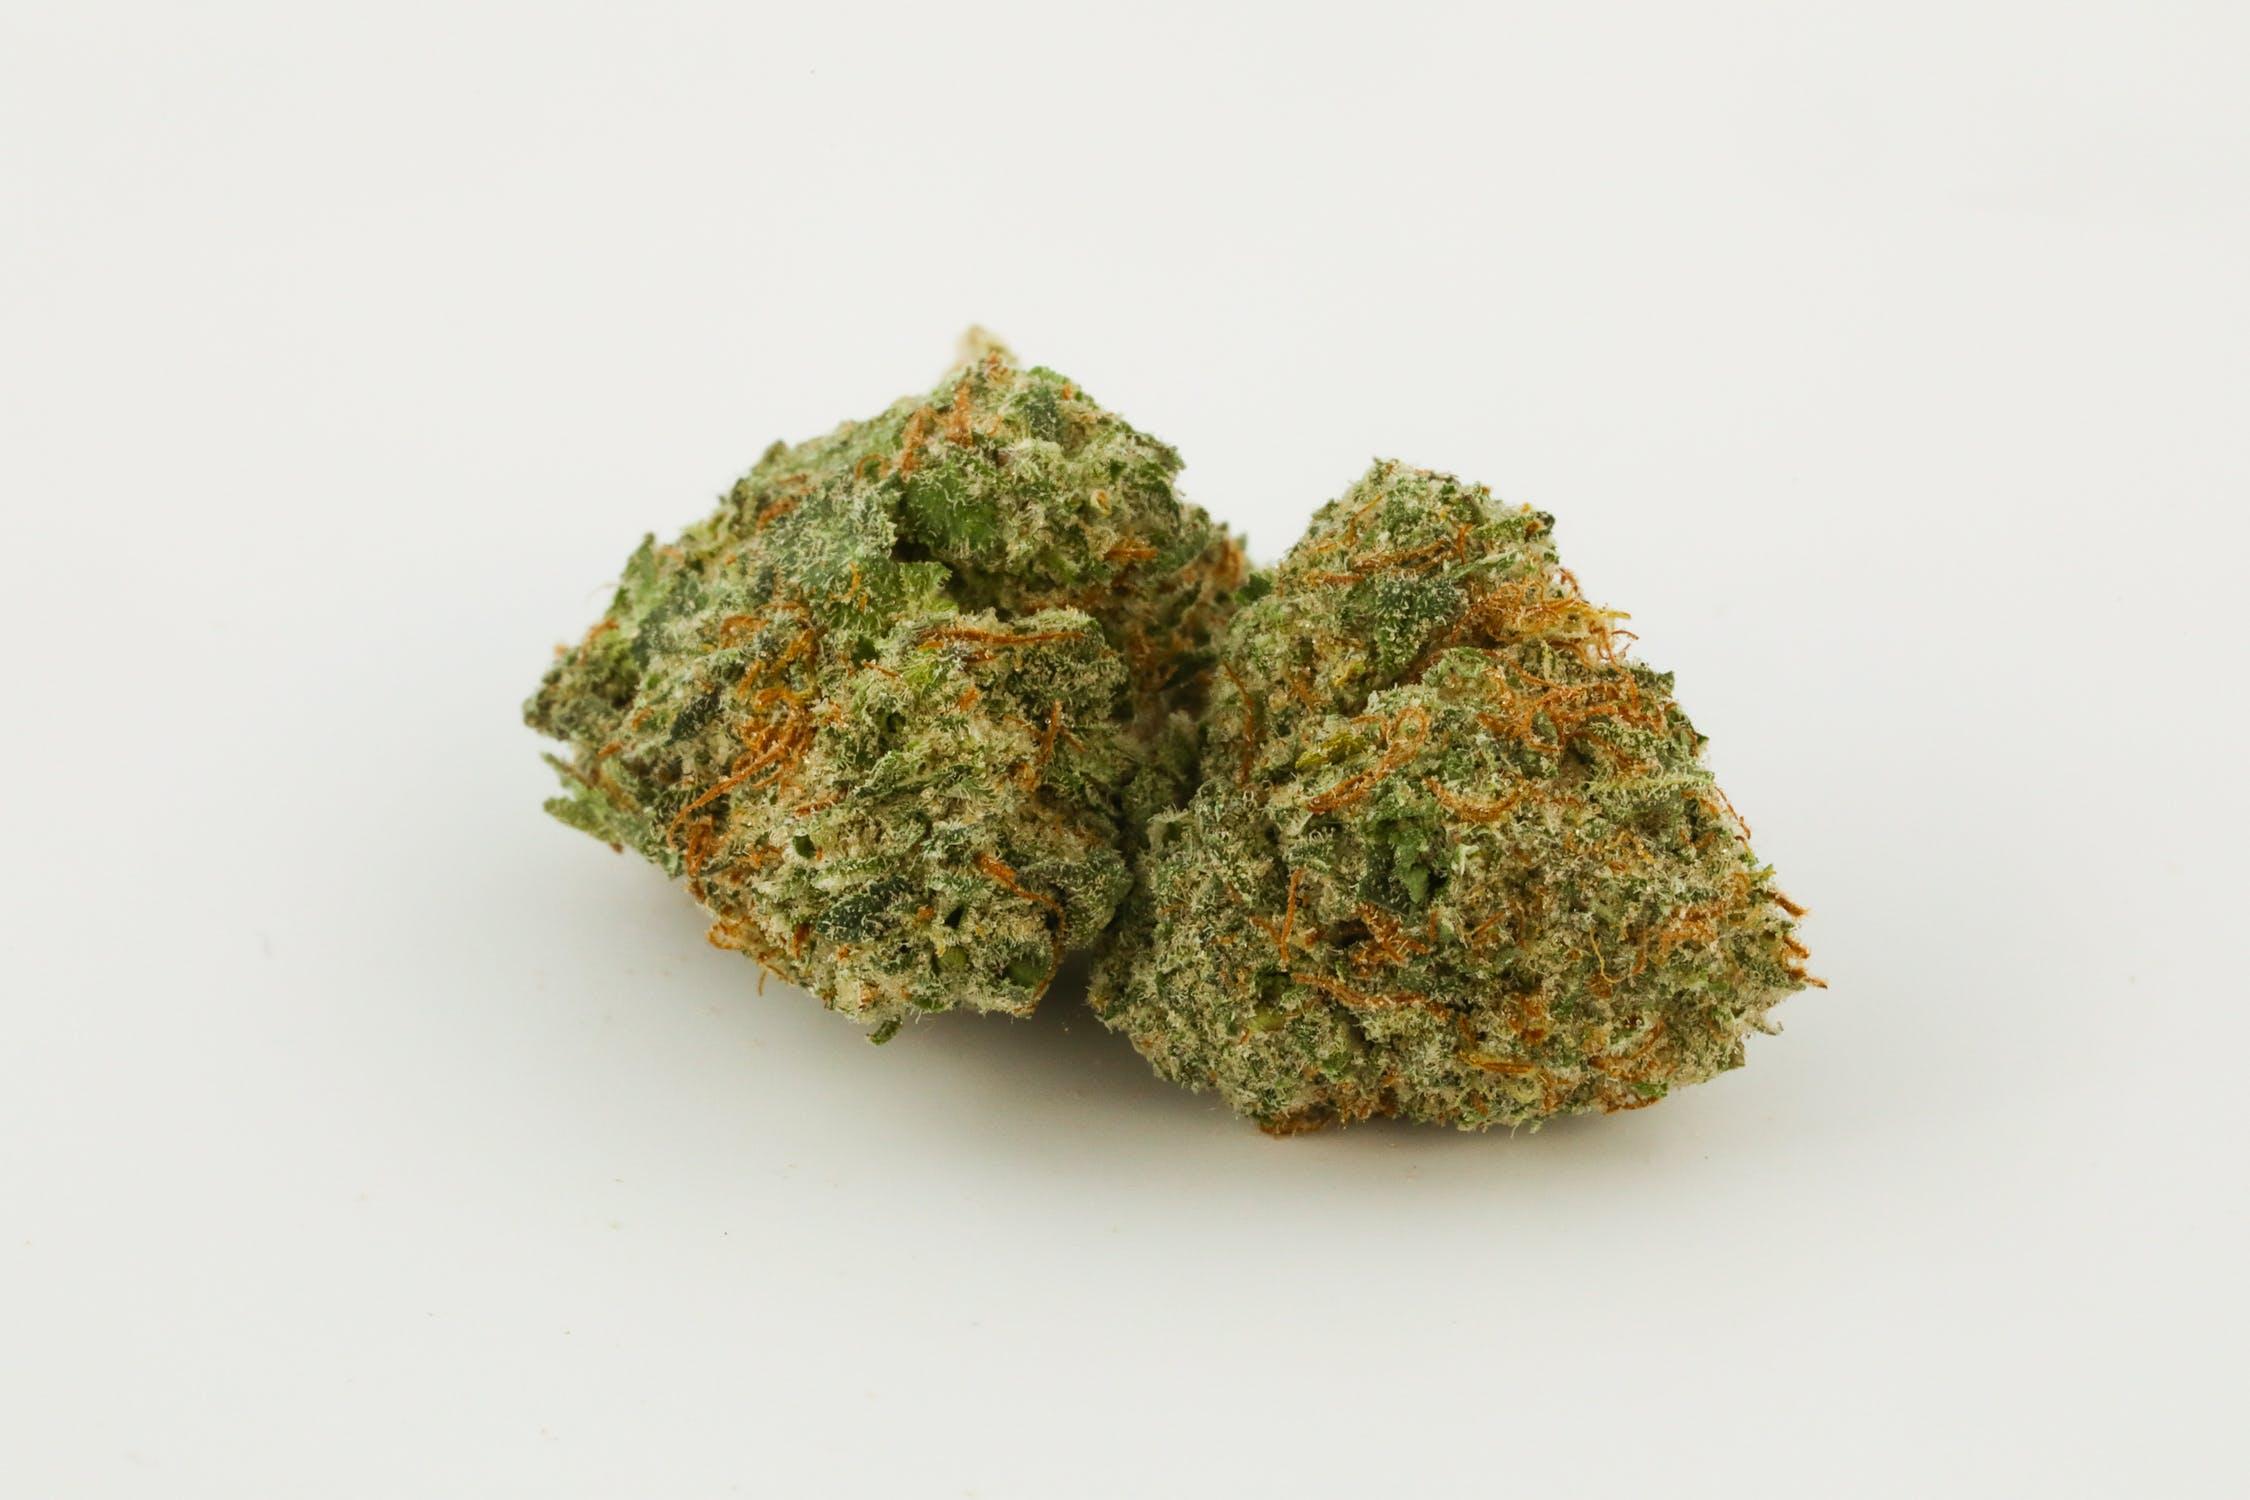 Critical Kush Weed; Critical Kush Cannabis Strain; Critical Kush Indica Marijuana Strain